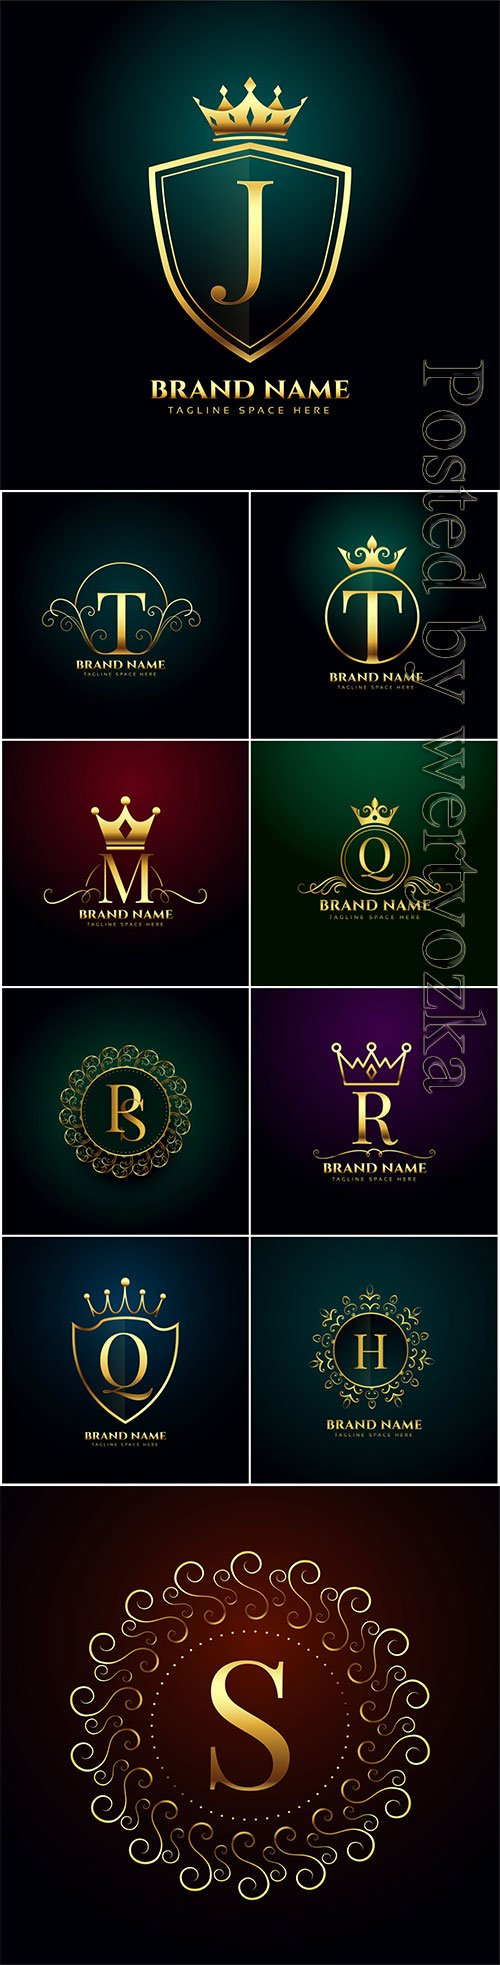 Luxury letter oranmental golden vector logo